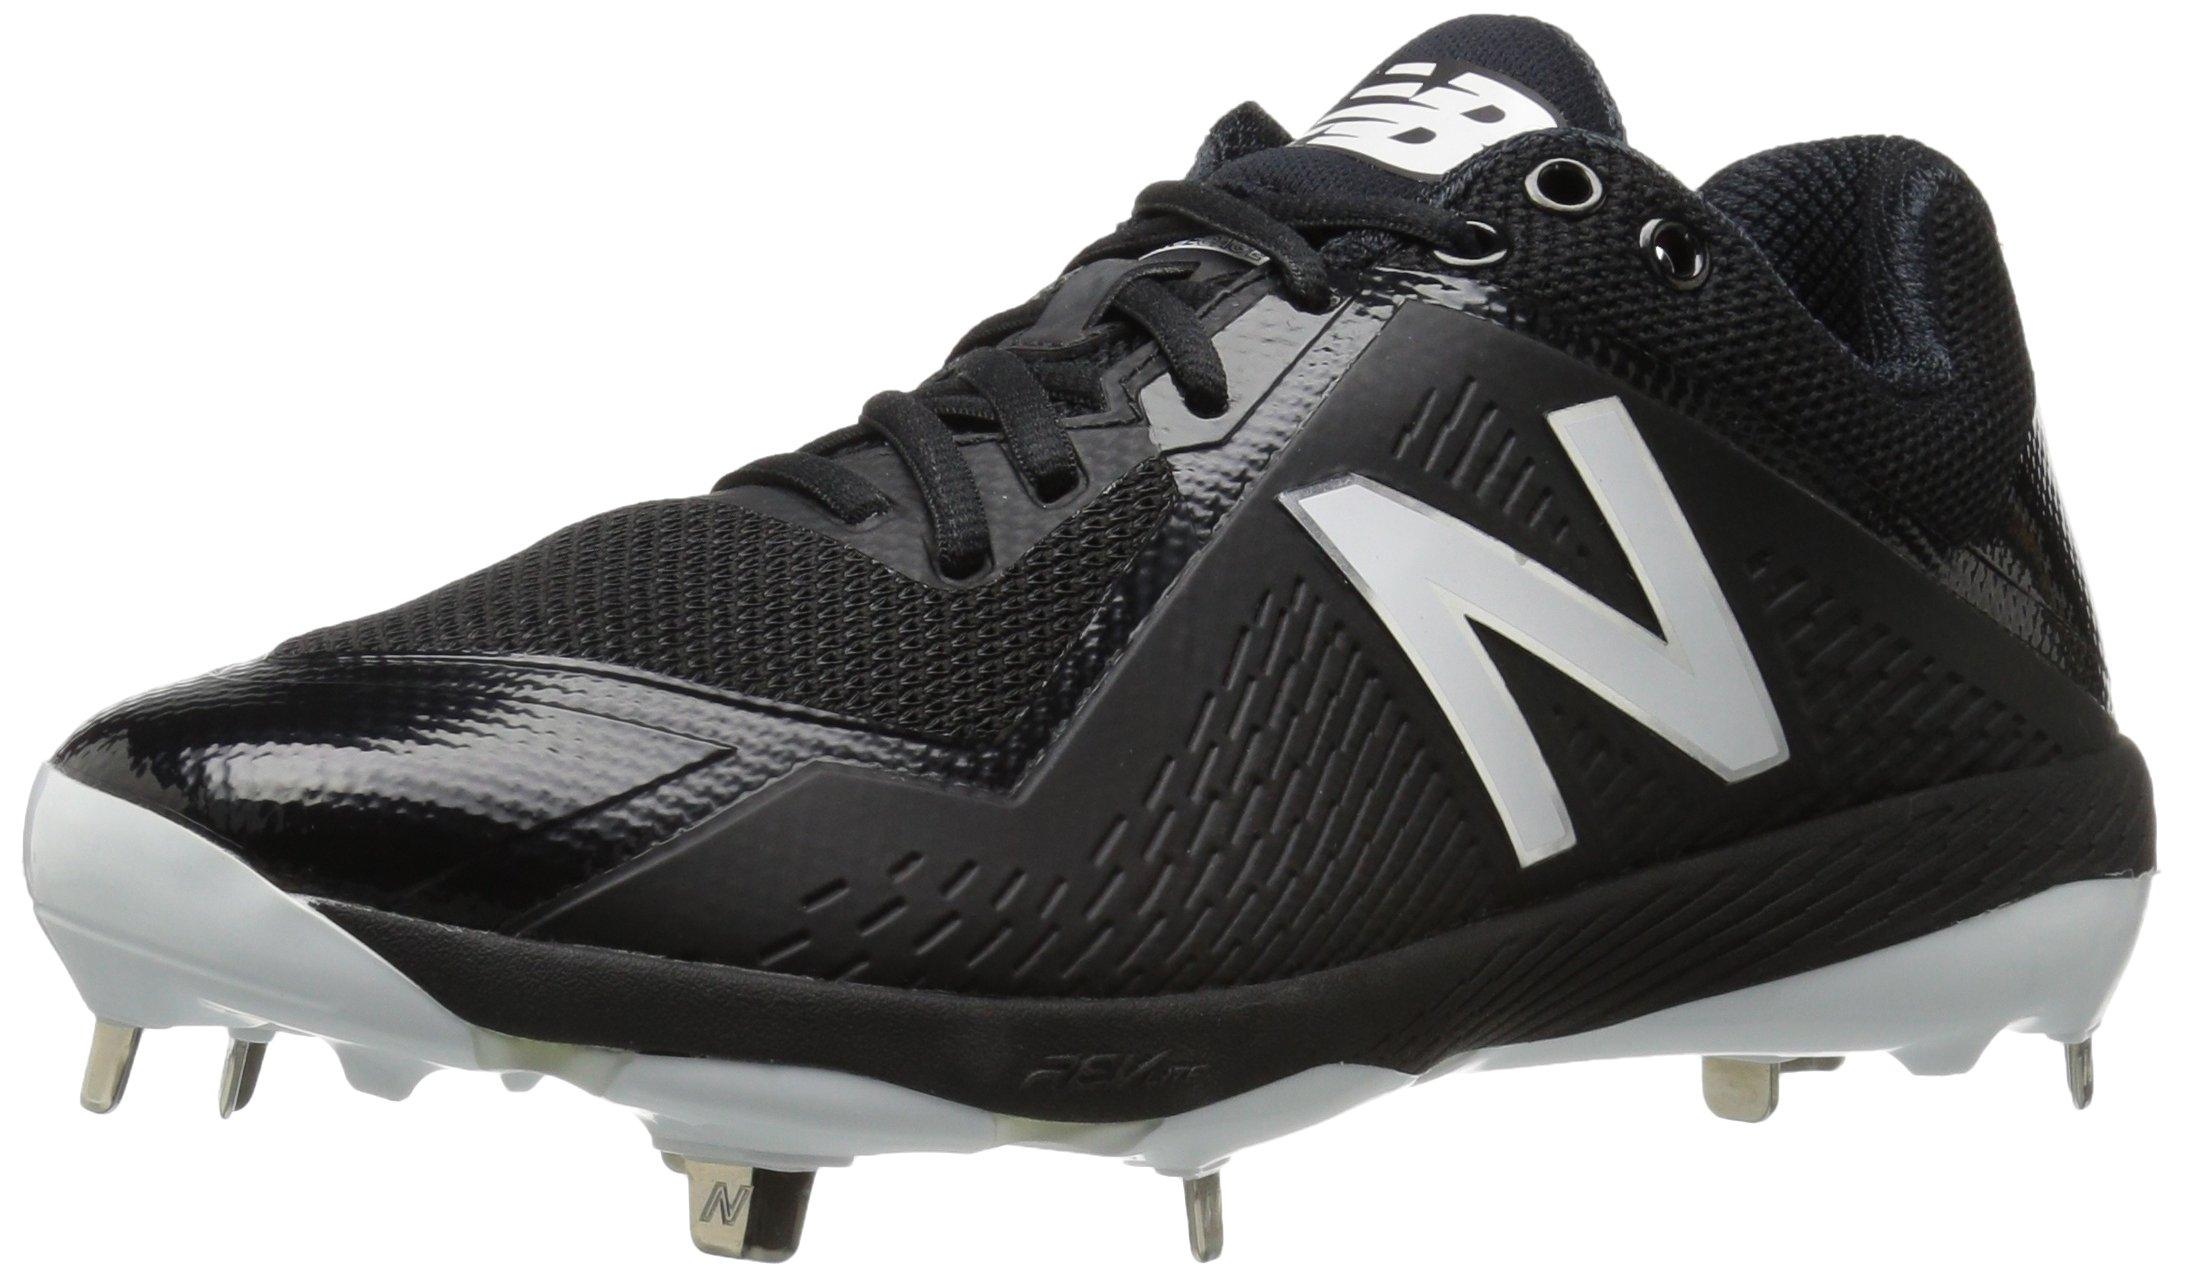 New Balance Men's L4040v4 Metal Baseball Shoe, Black, 11.5 D US by New Balance